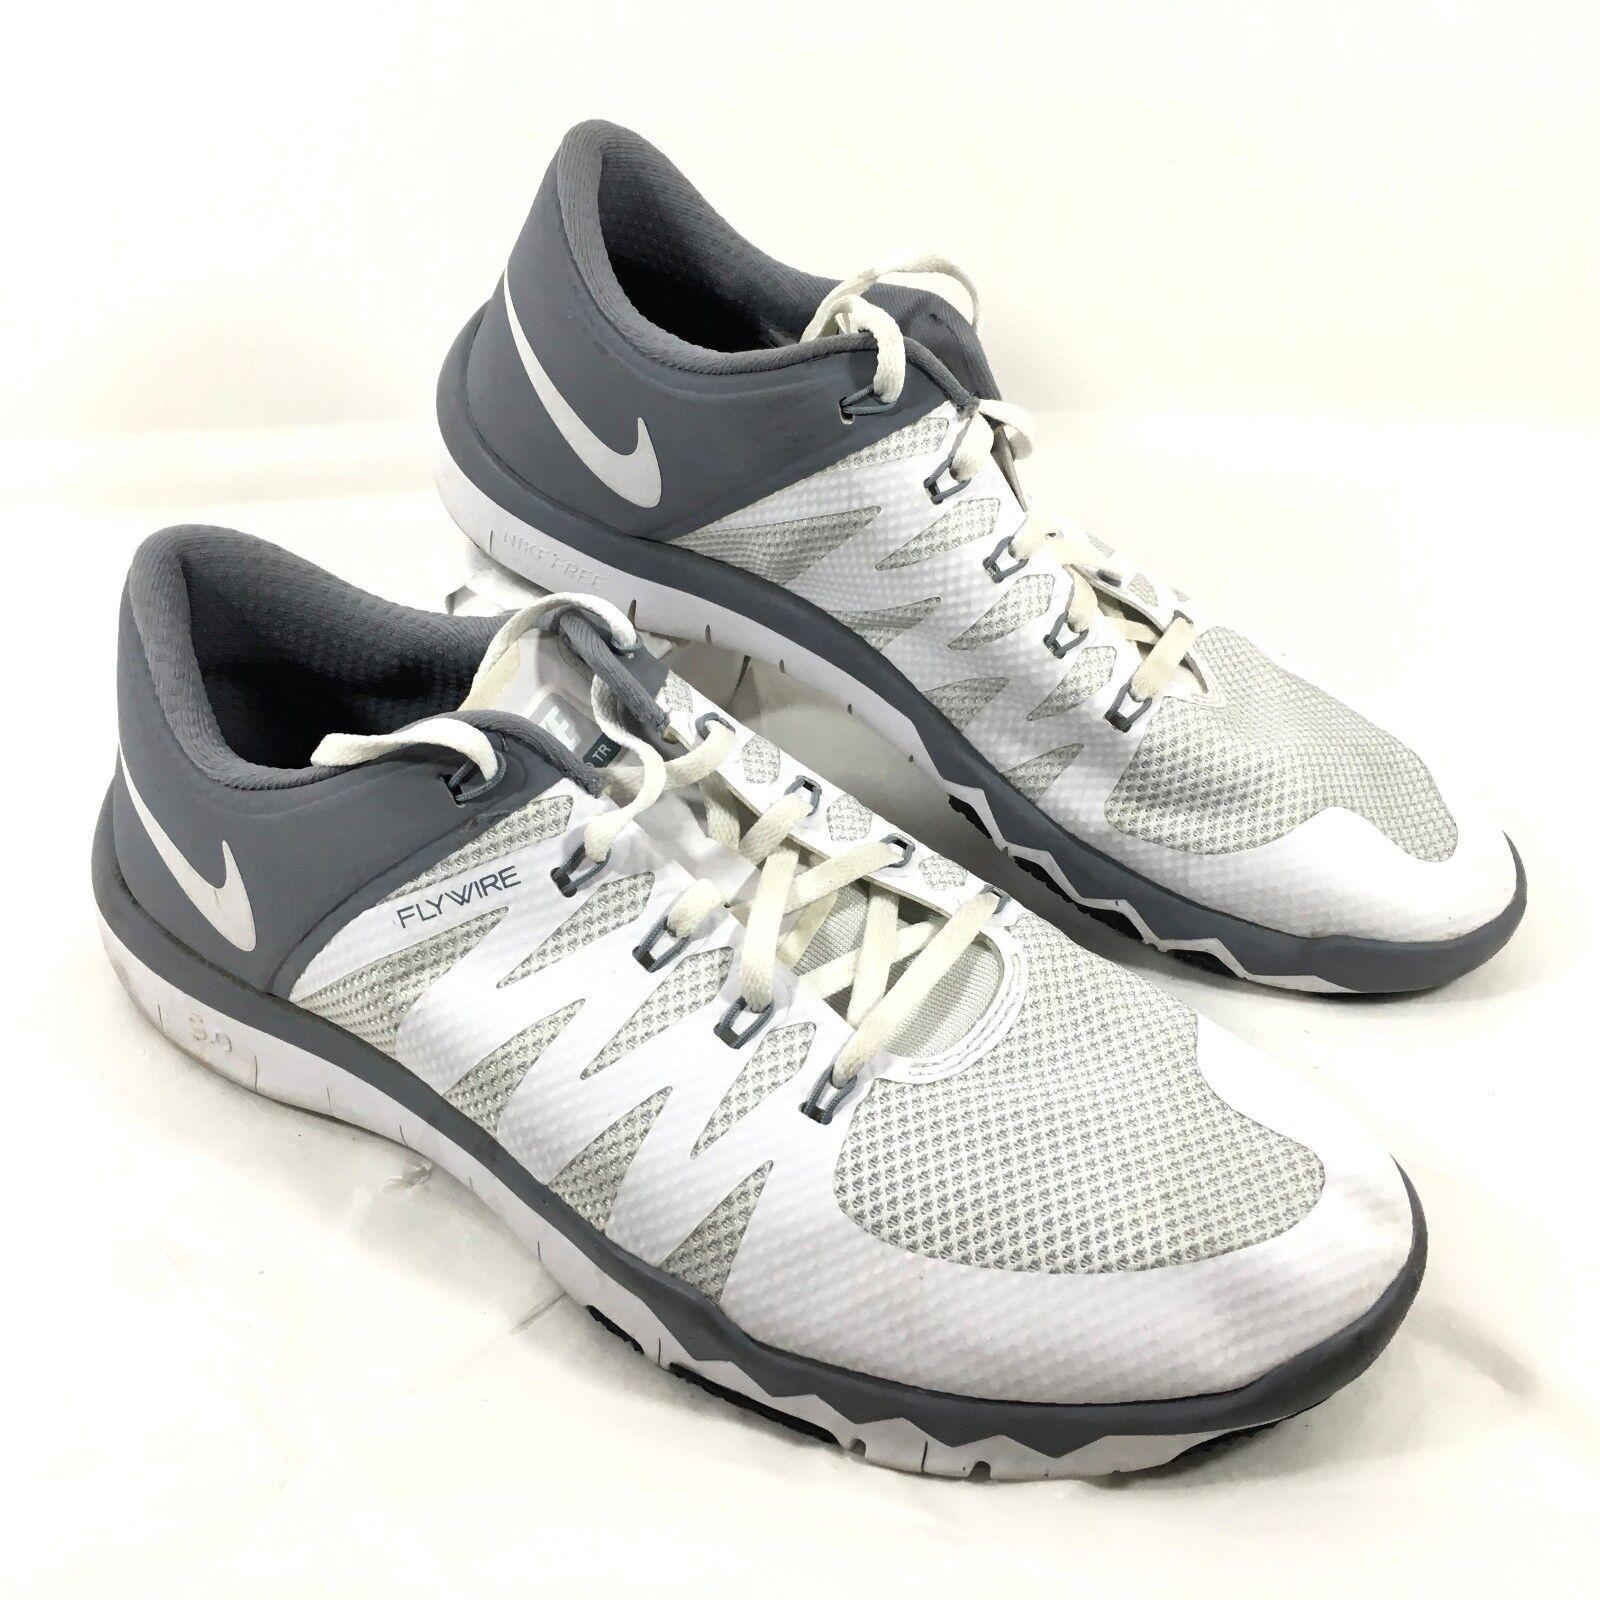 GUC Men's Free Nike Flywire Free Men's 5.0 TR Running Shoes White Gray Sz 11.5 M 27564f